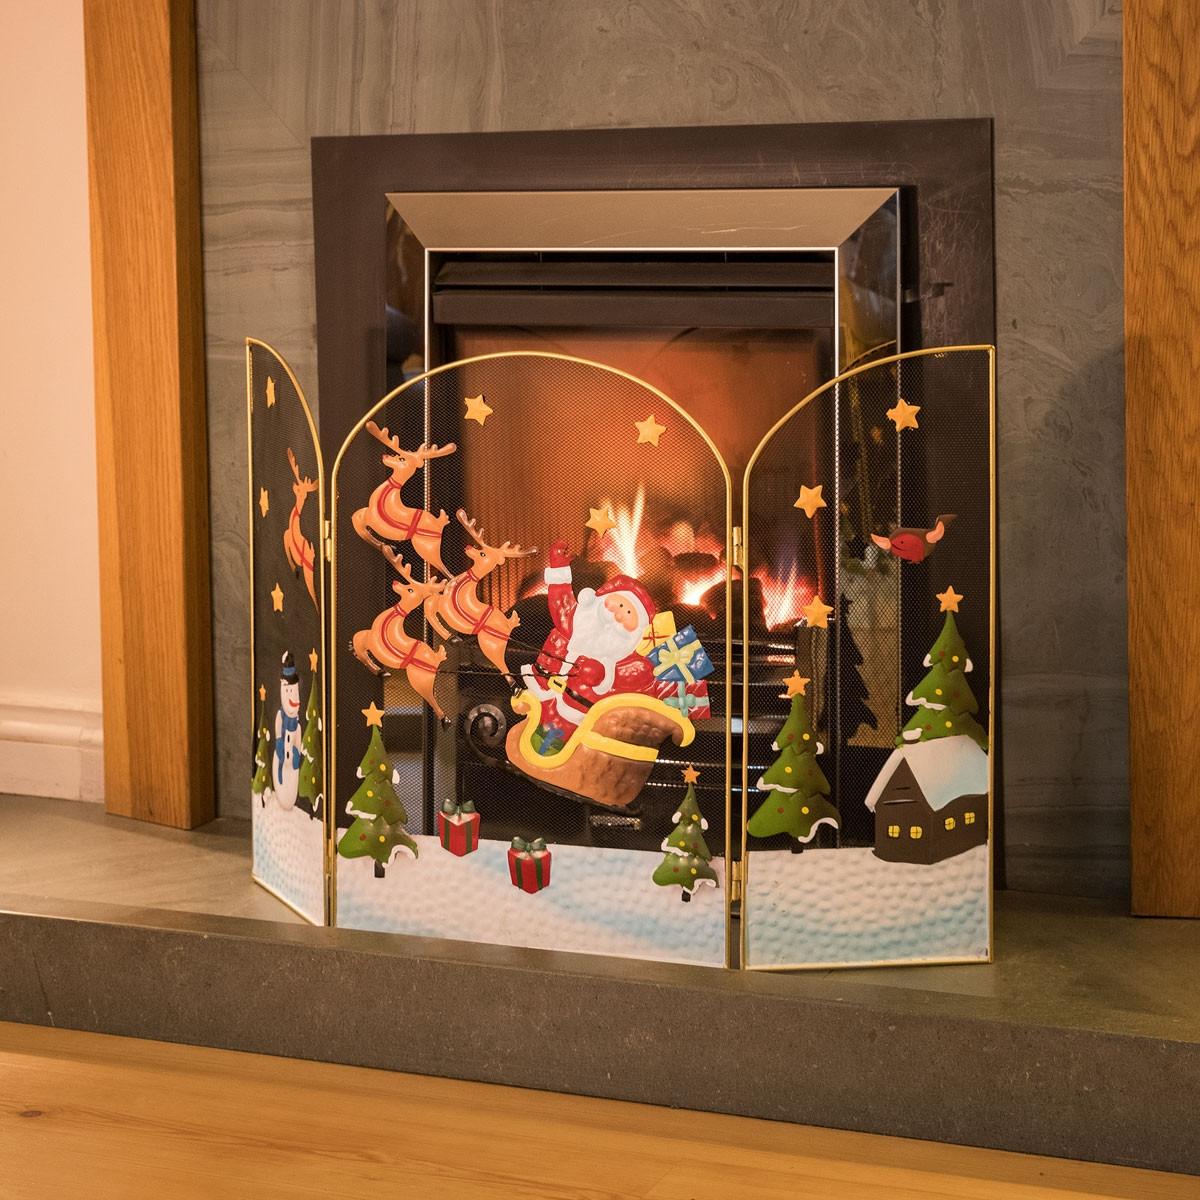 Christmas Themed Fireplace Screen  3 Panel Fireguard Fireplace Screen Santa Sleigh Christmas